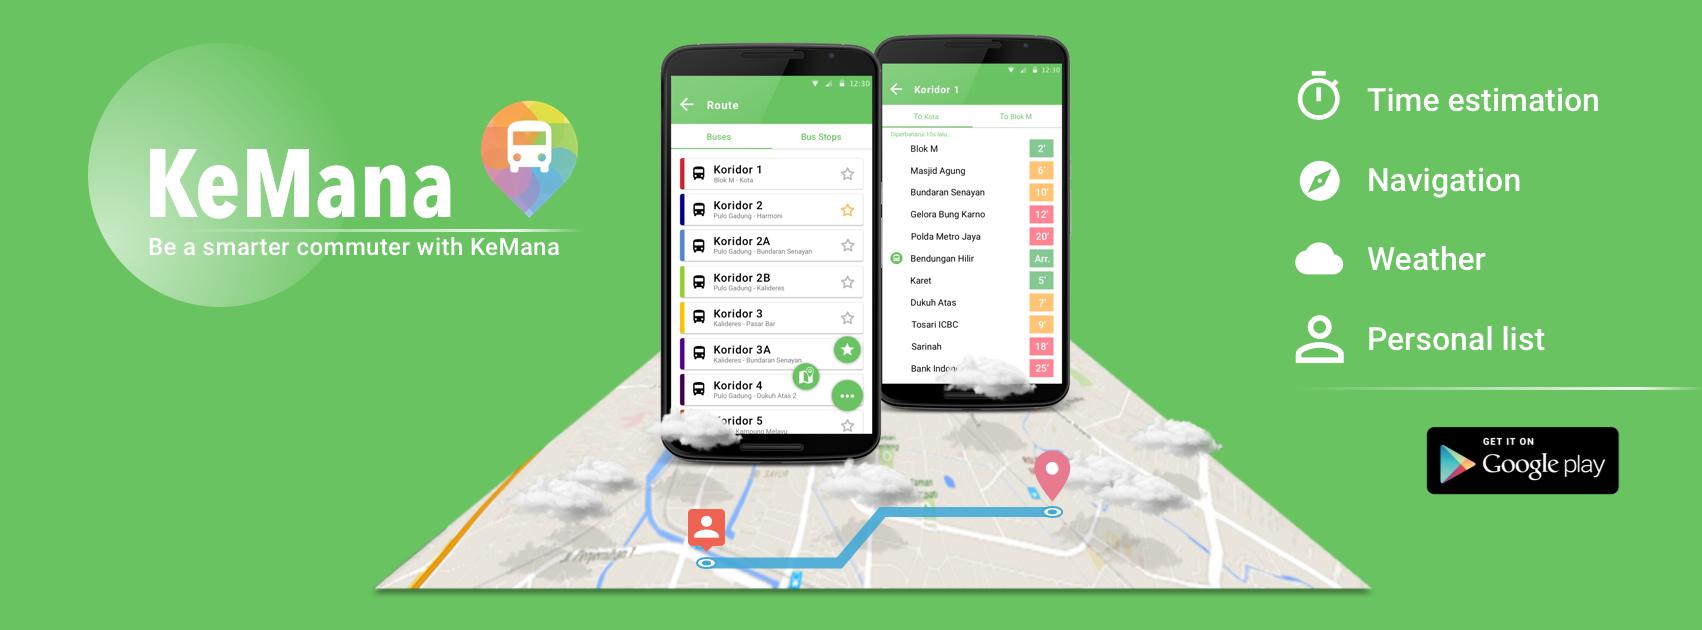 Bus app/ Android app/ banner/advertisement/screenshot | MyWorks